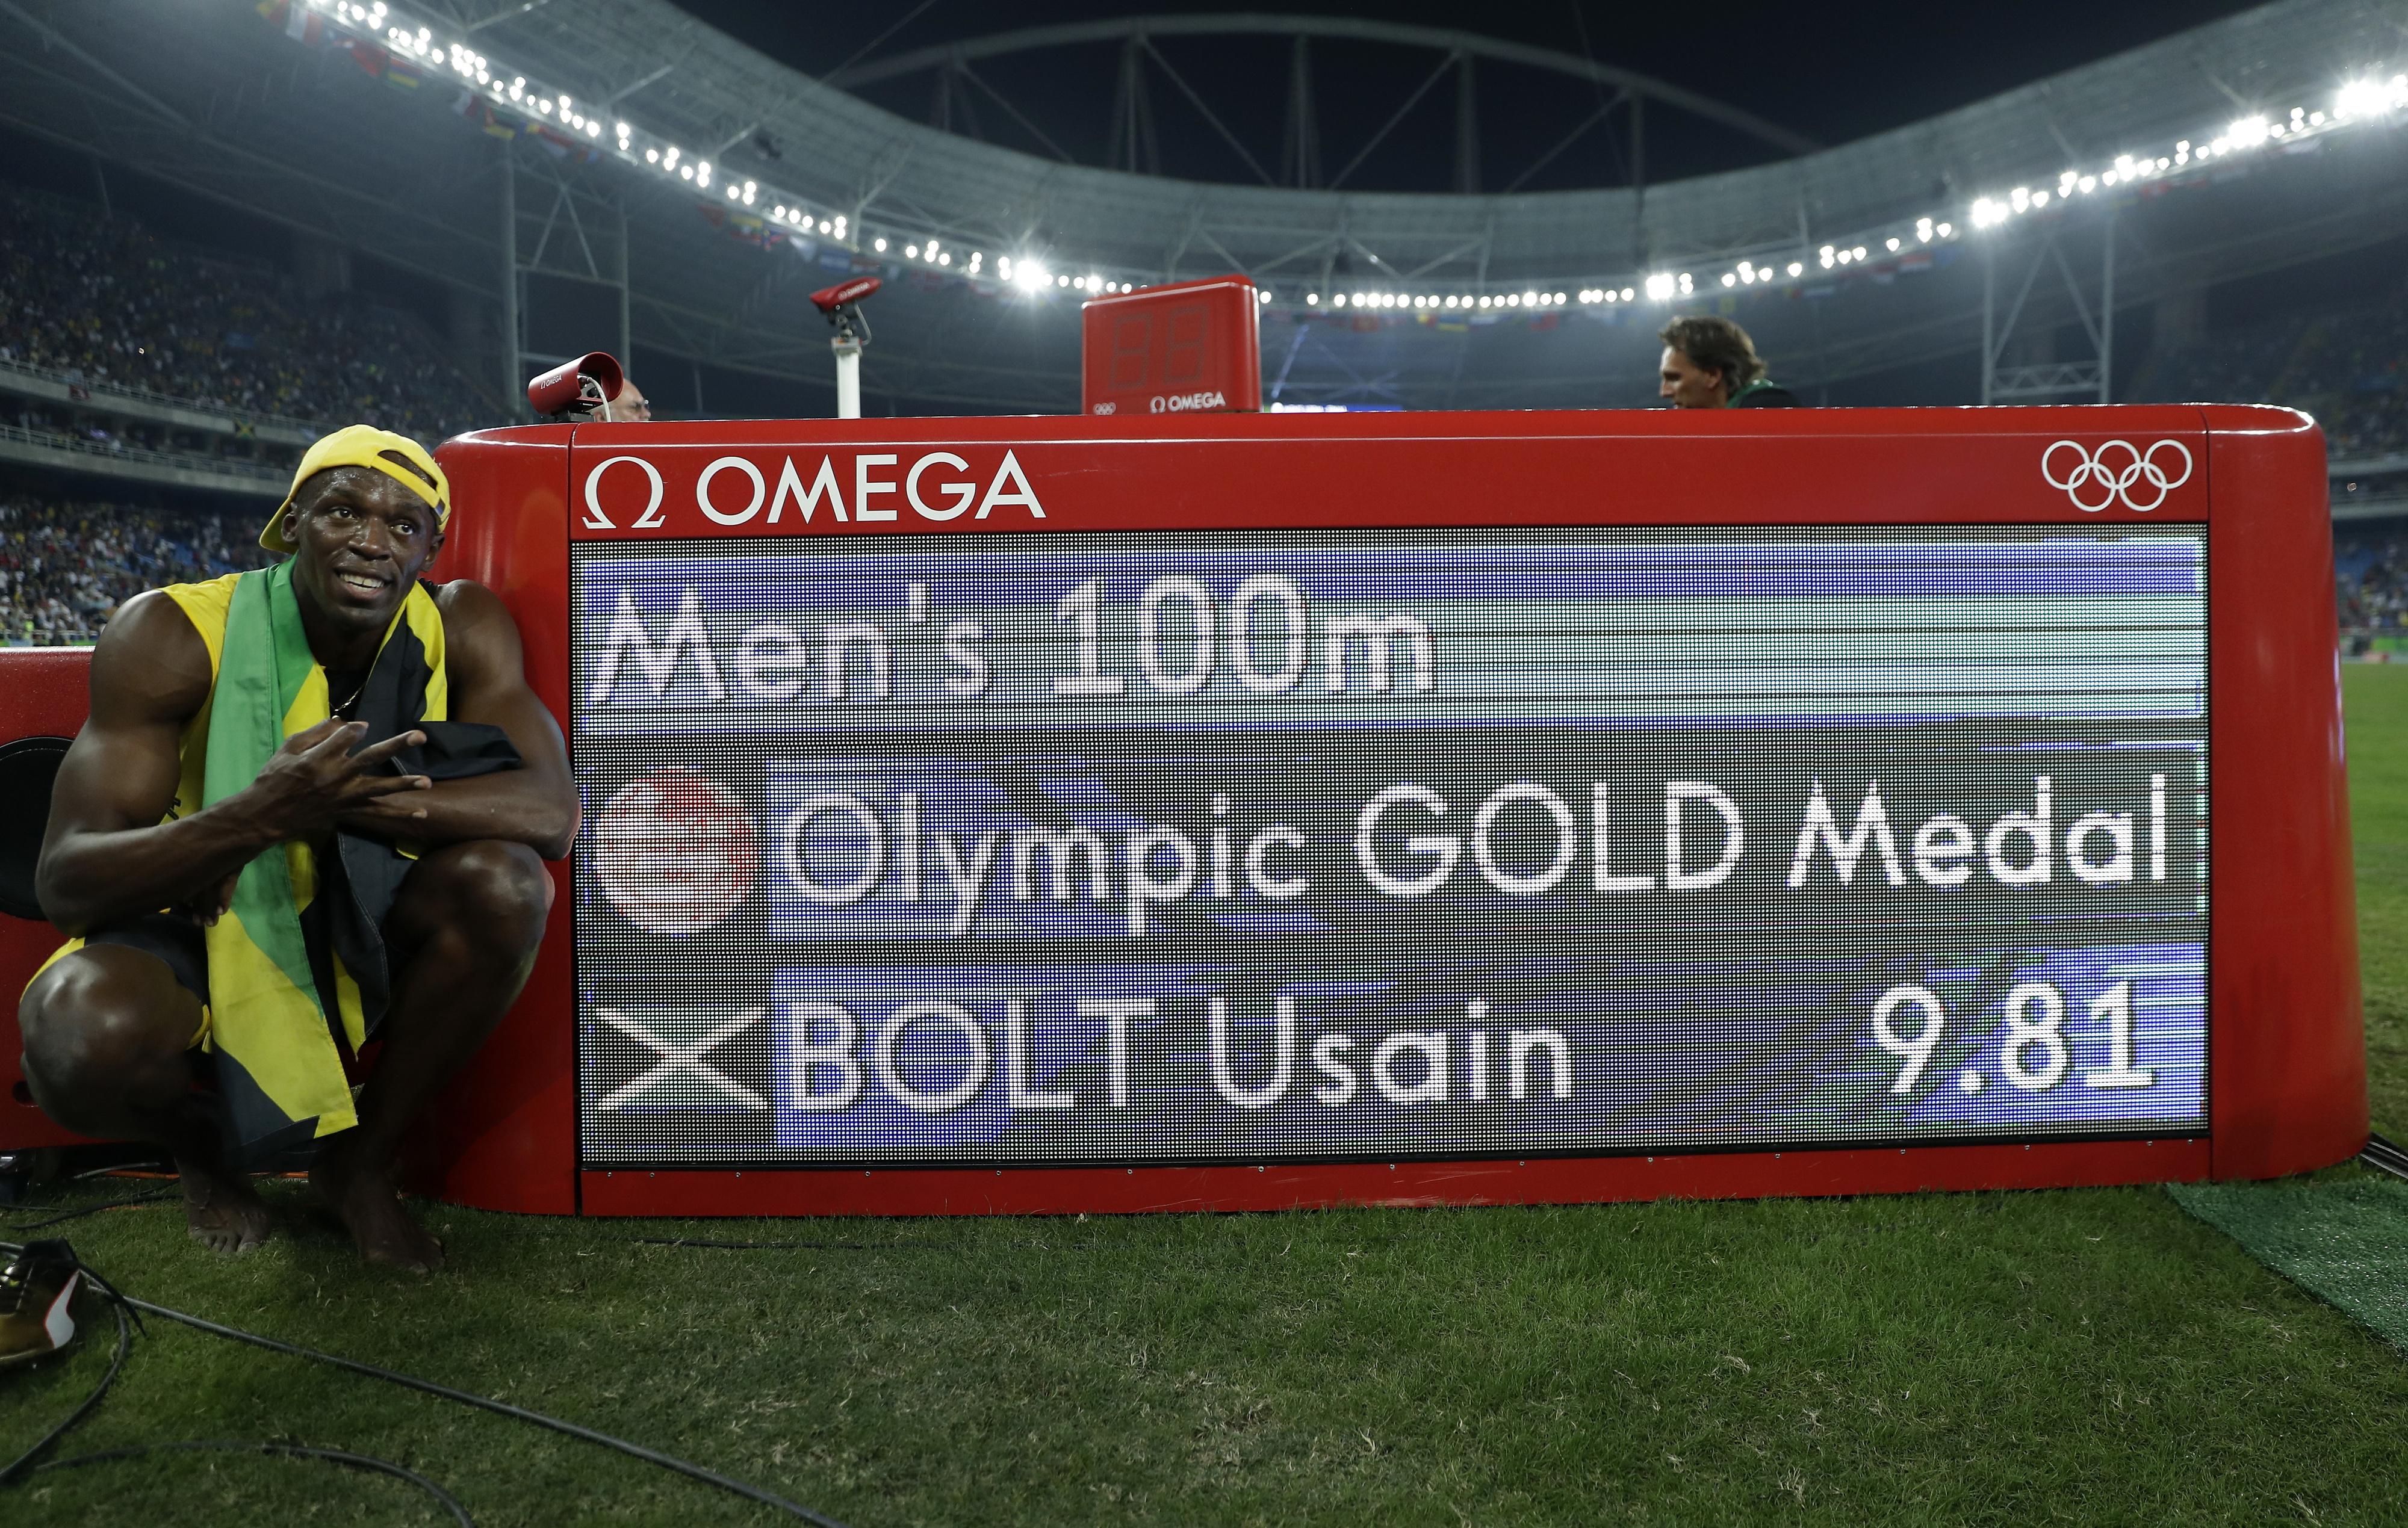 Bolt vyhral siedme zlato, Van Niekerk prekonal Johnsona